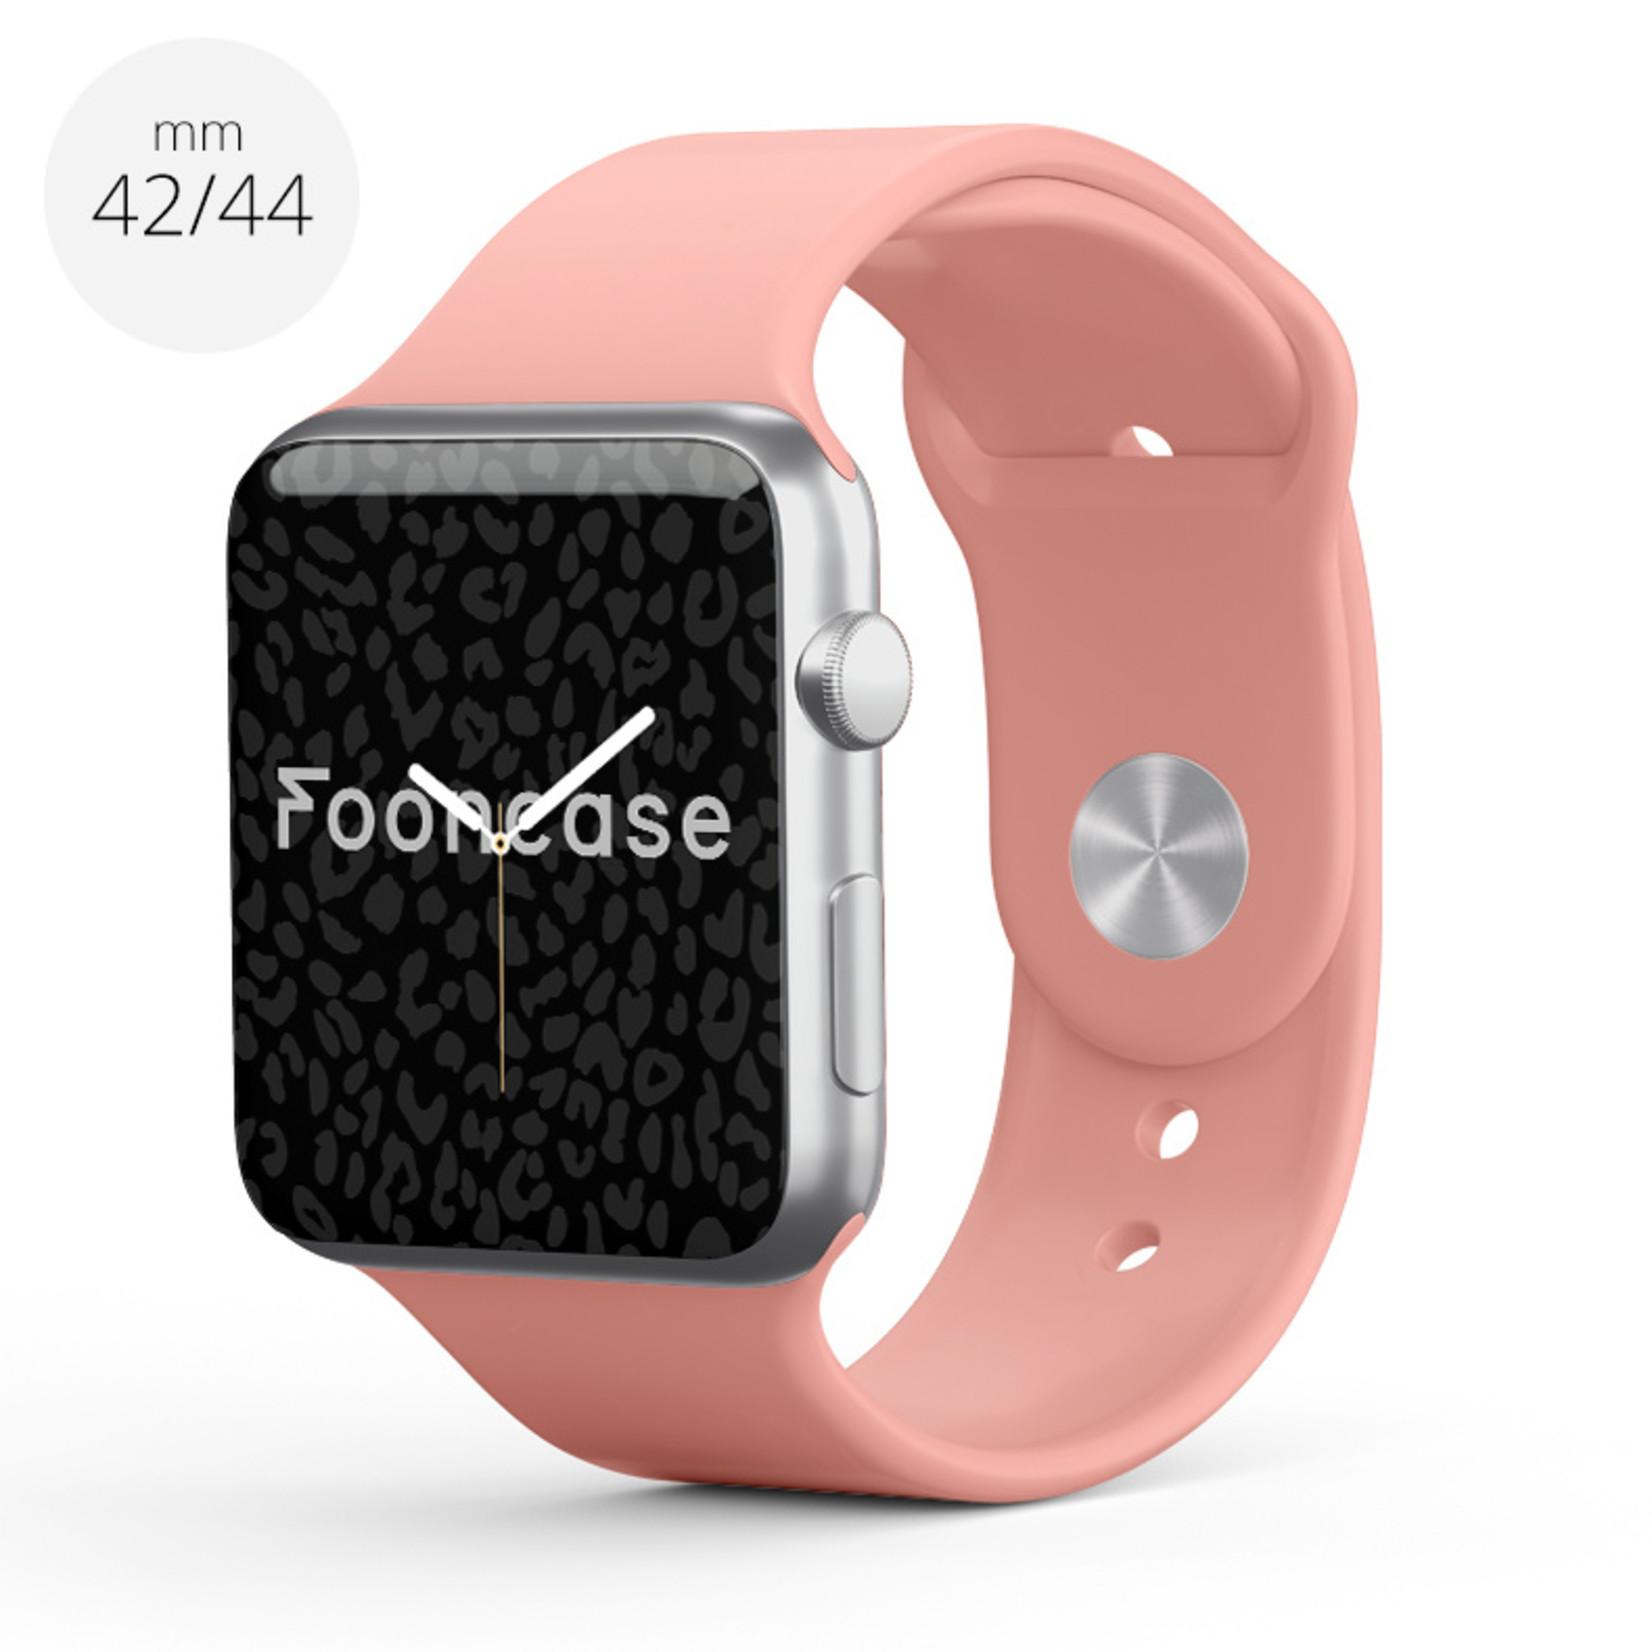 FOONCASE Apple Watch Series (1 t/m 6 / SE) - Peach - 42/44mm